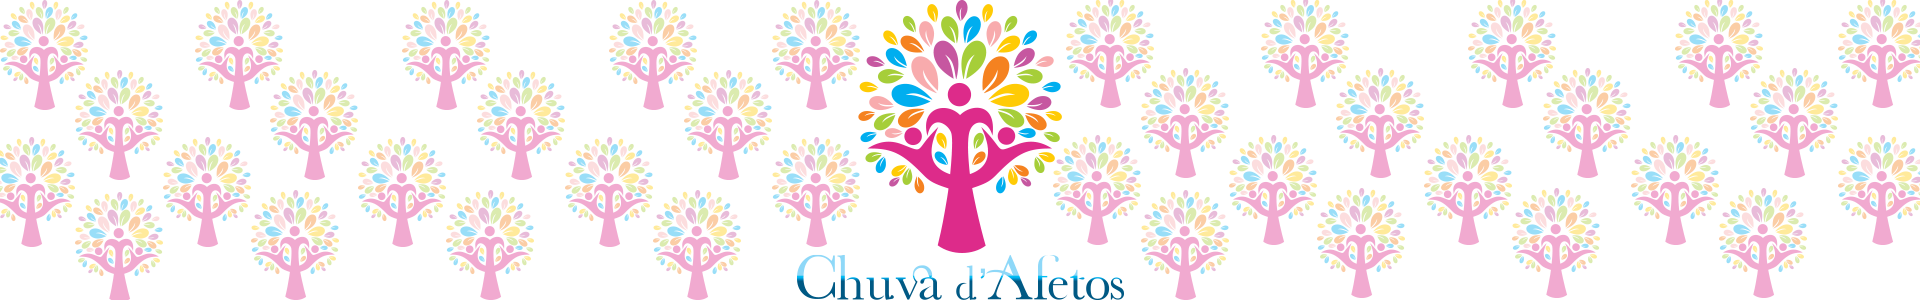 Chuvadafetos-banner